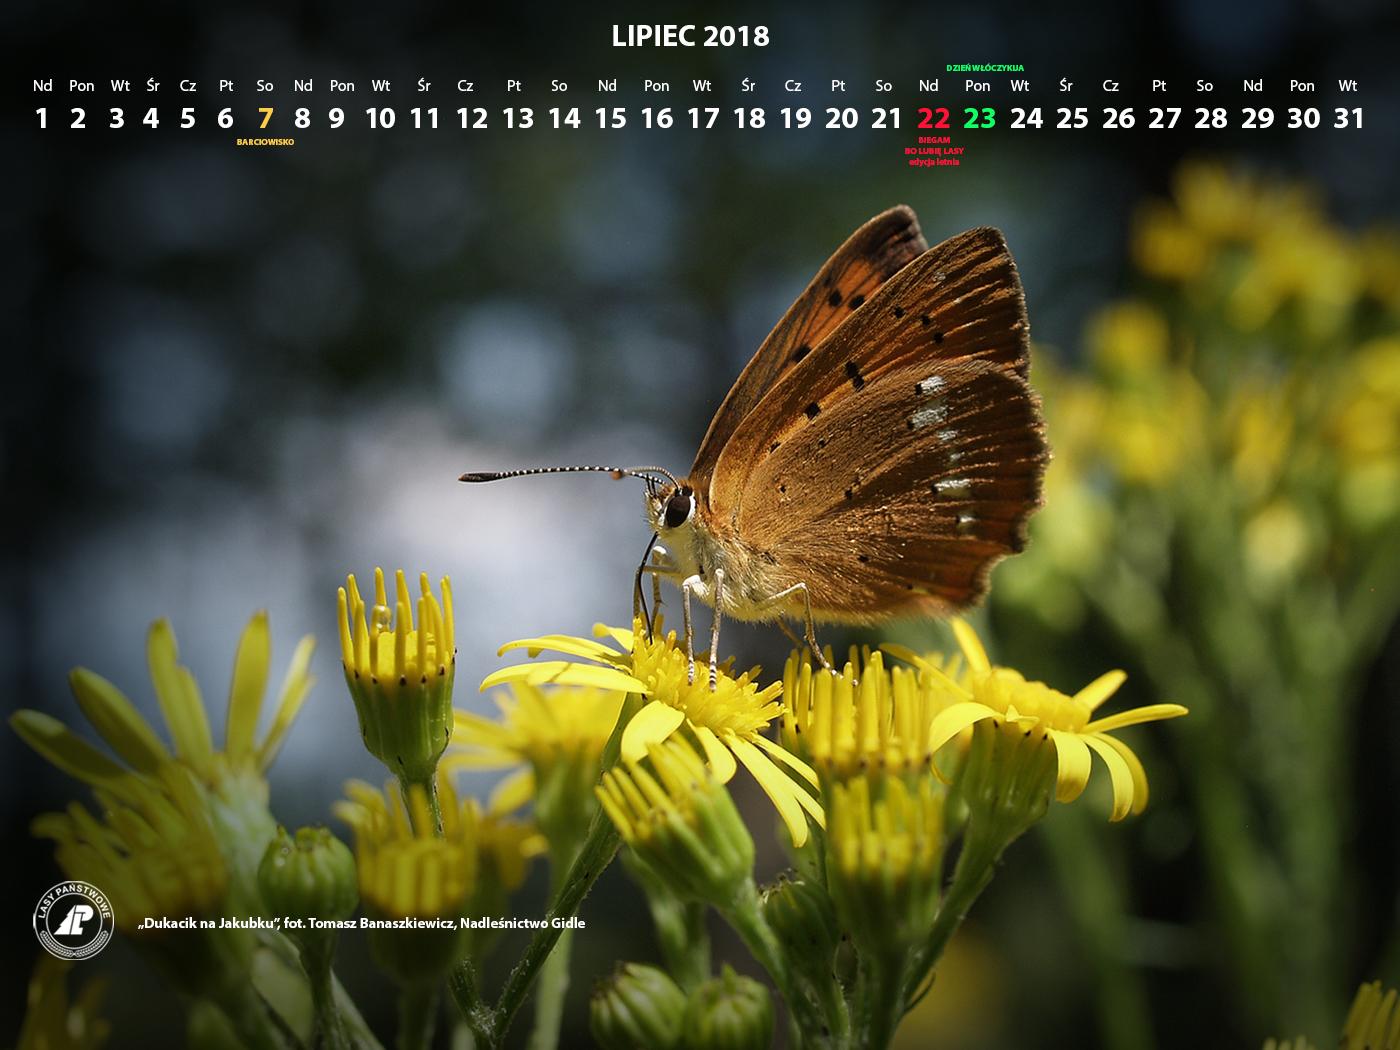 Kalendarz_lipiec_2018_1400x1050[1].jpg